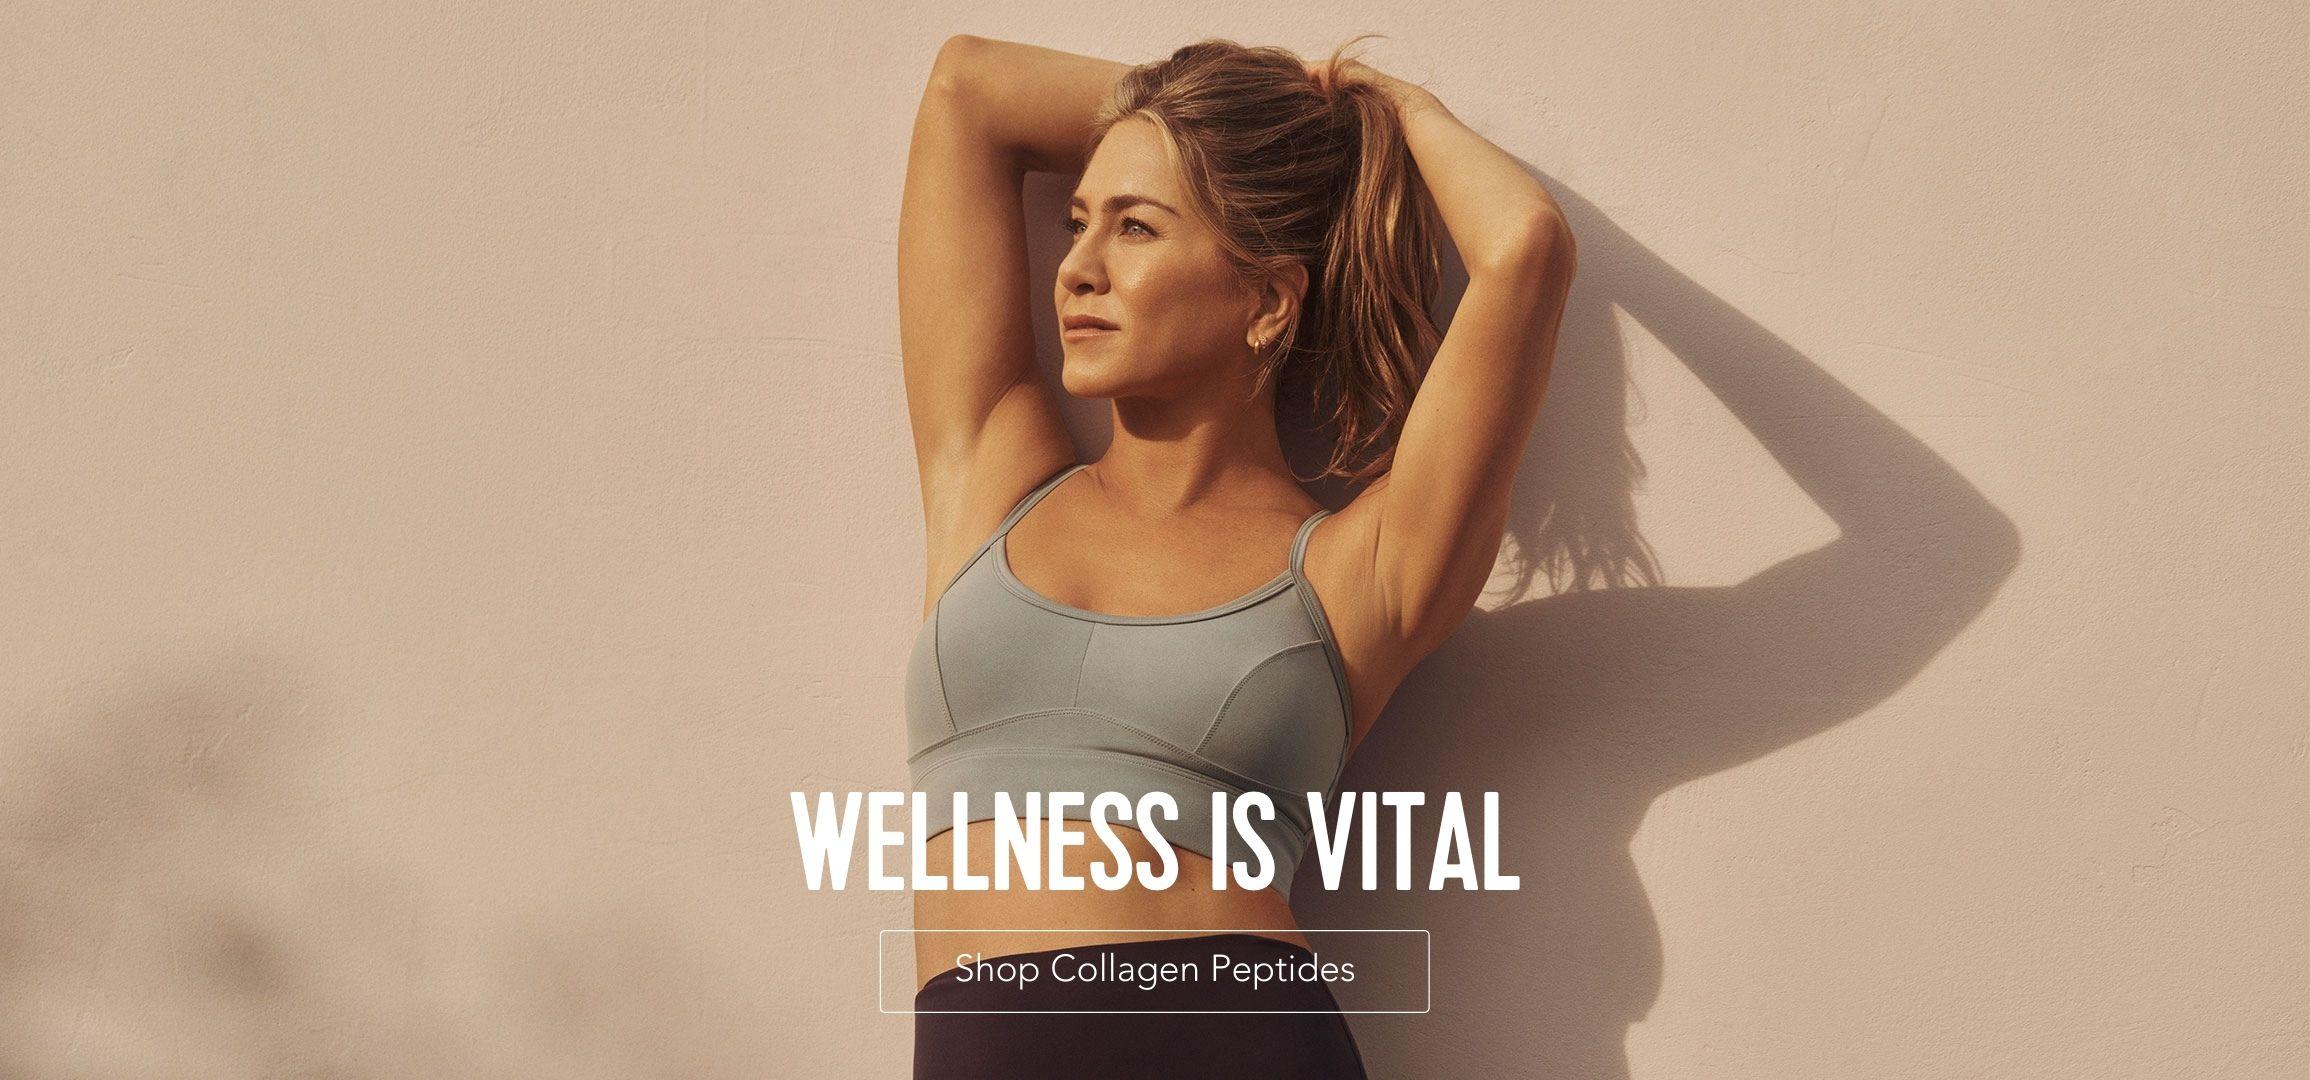 Shop Collagen Peptides